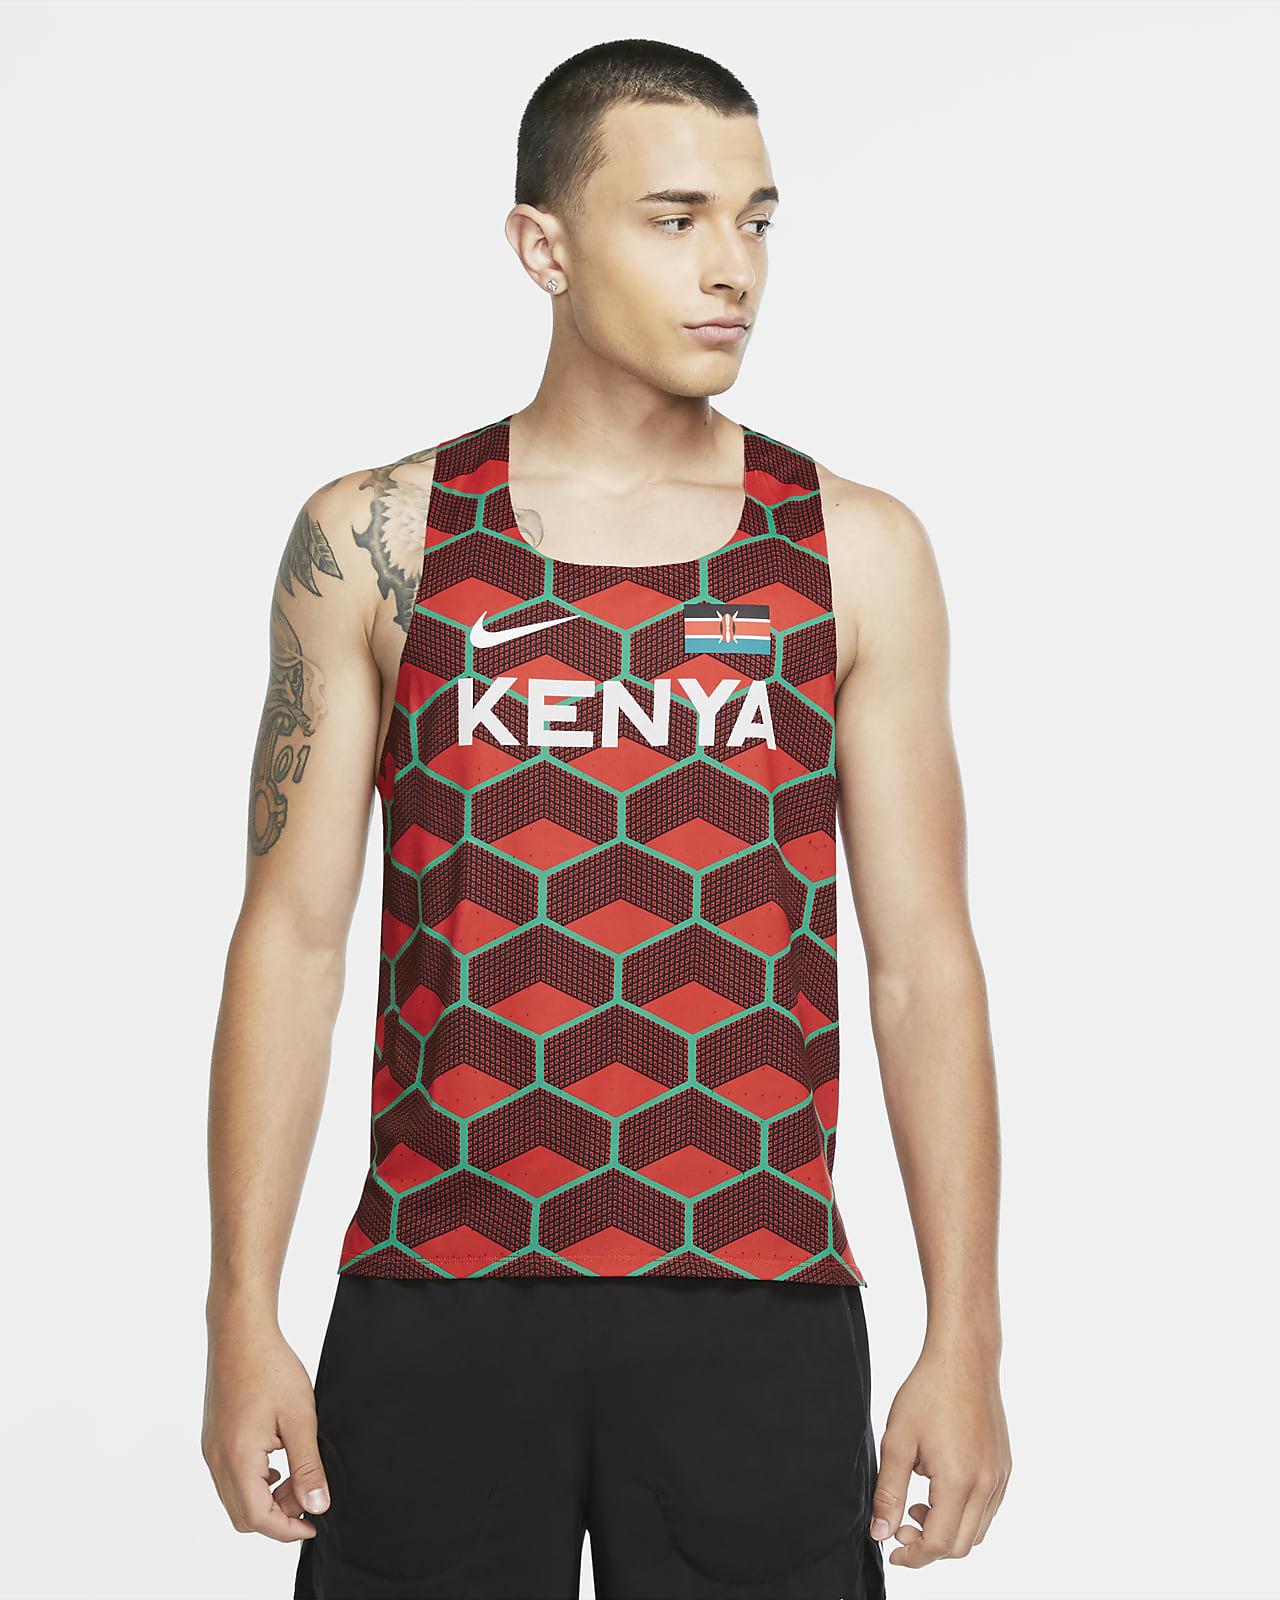 Camiseta sin mangas de running para hombre Nike Dri-FIT ADV Team Kenya AeroSwift